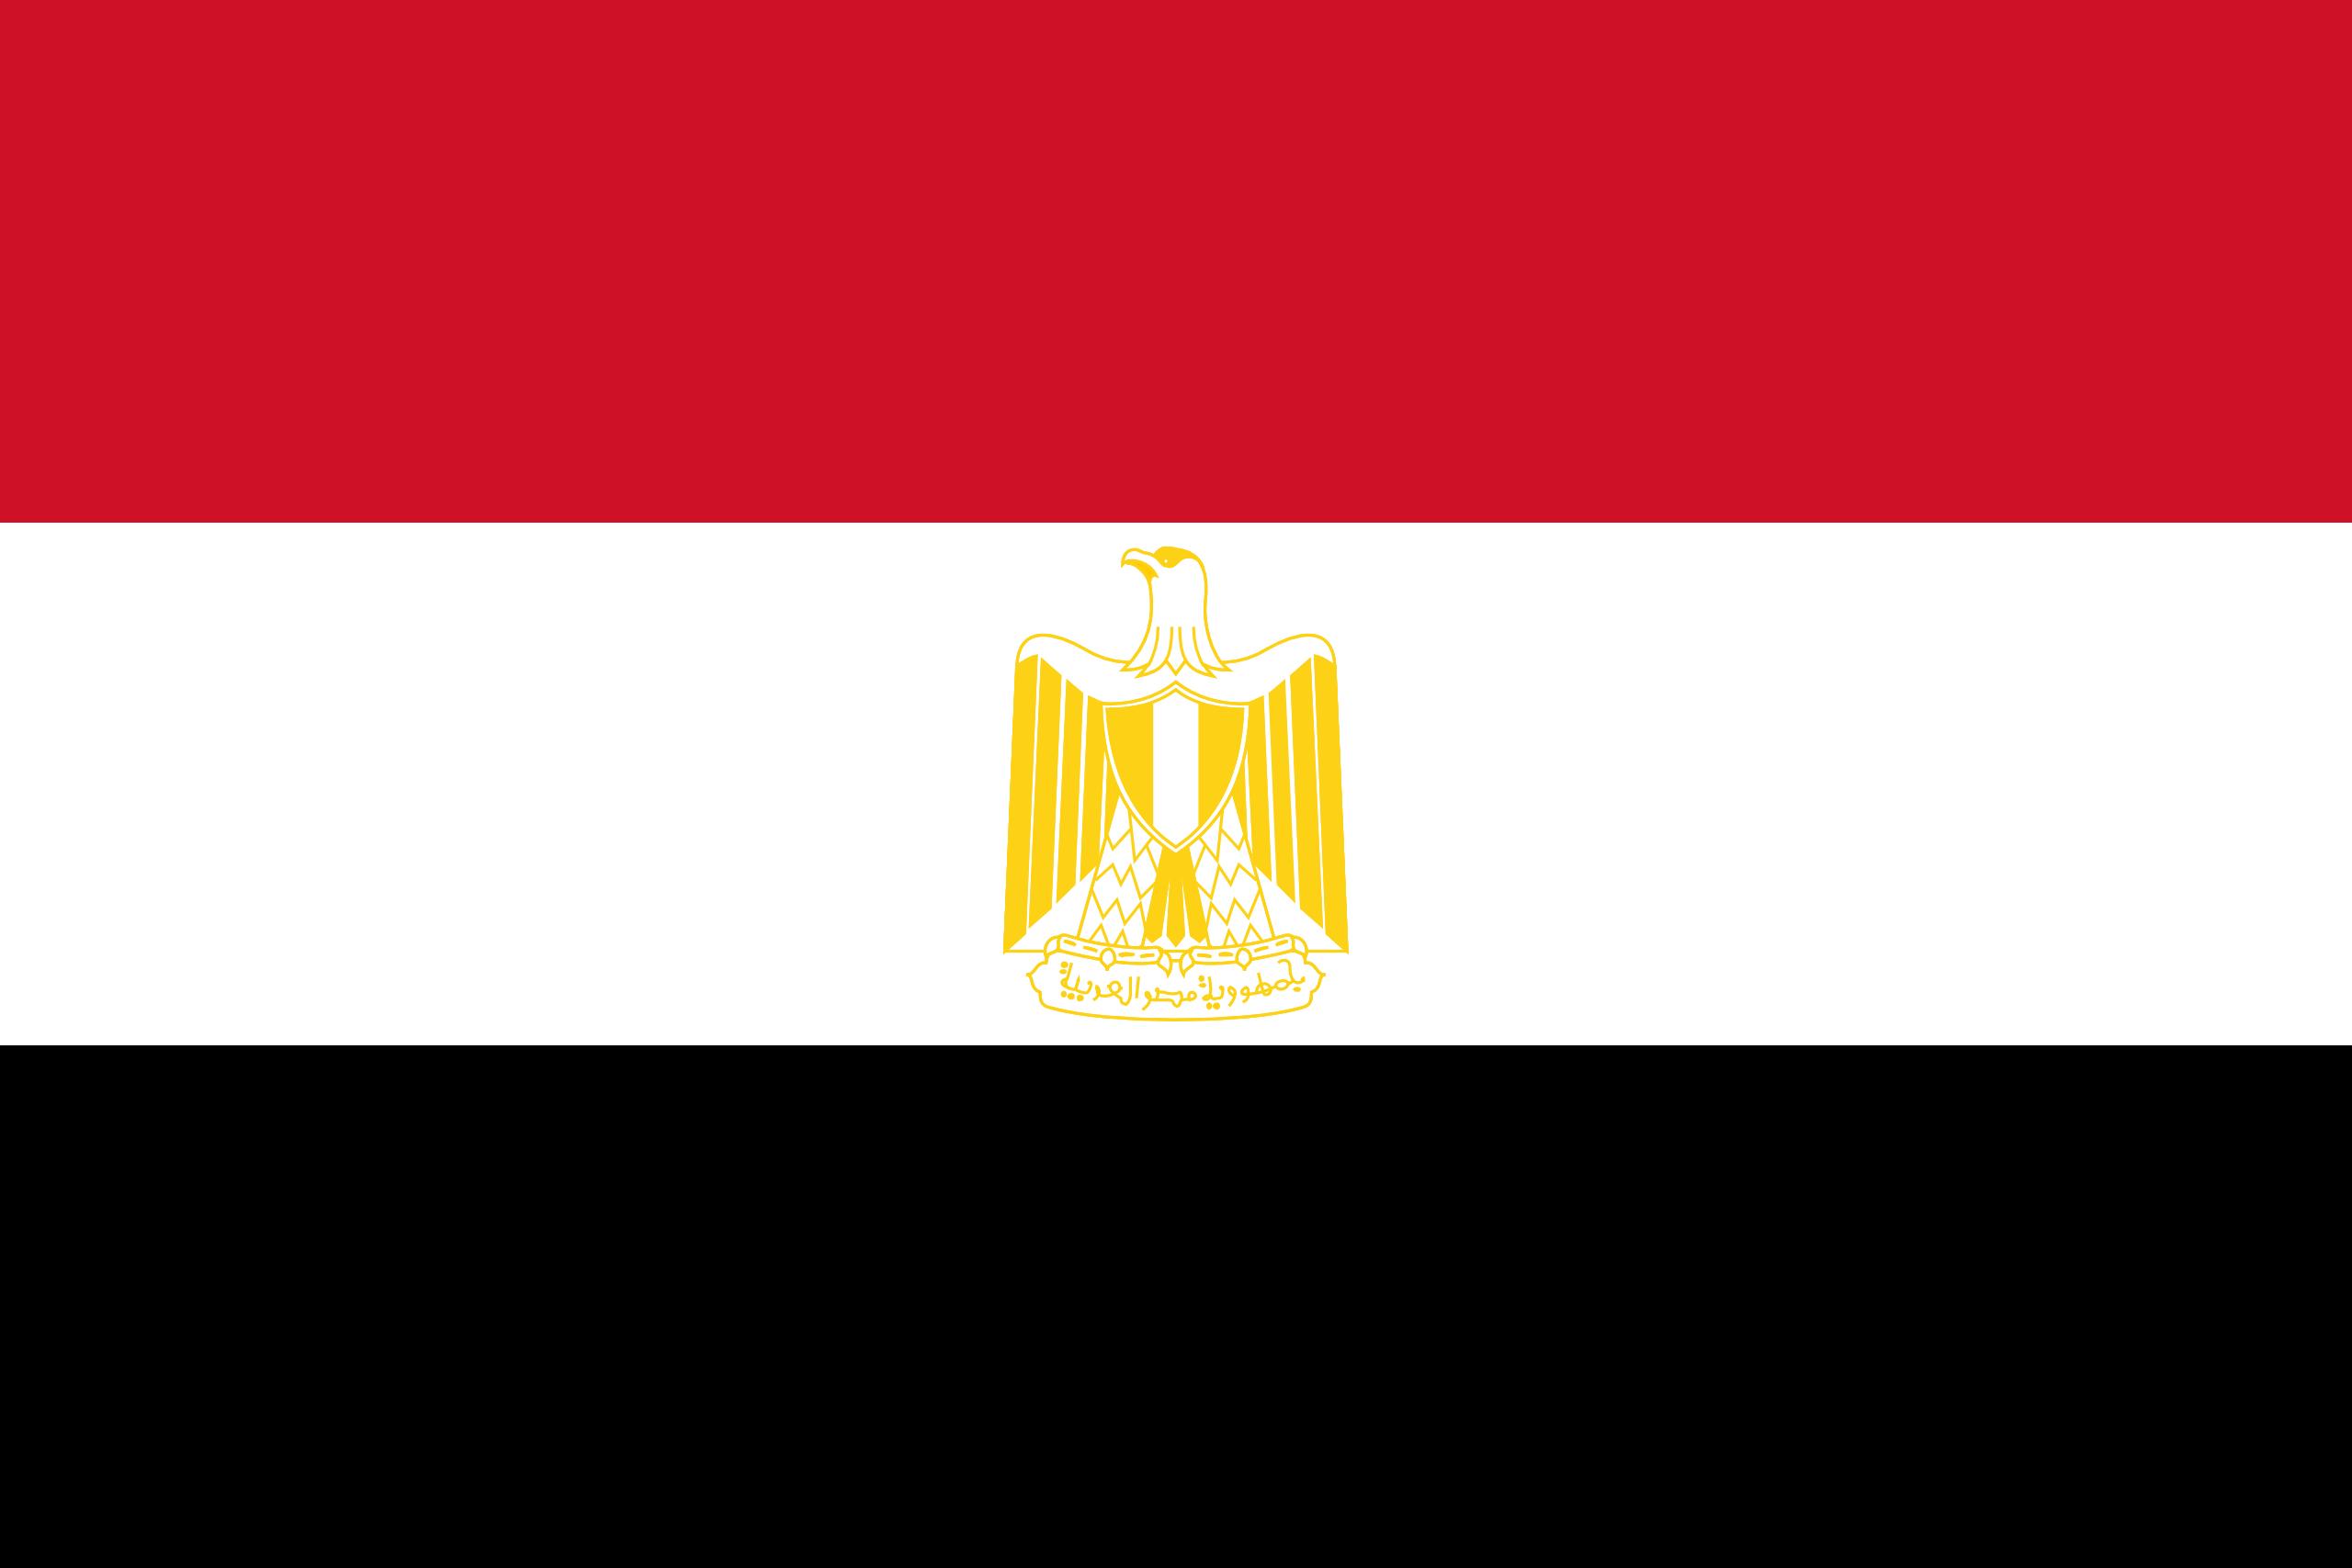 egipto, paese, emblema, logo, simbolo - Sfondi HD - Professor-falken.com